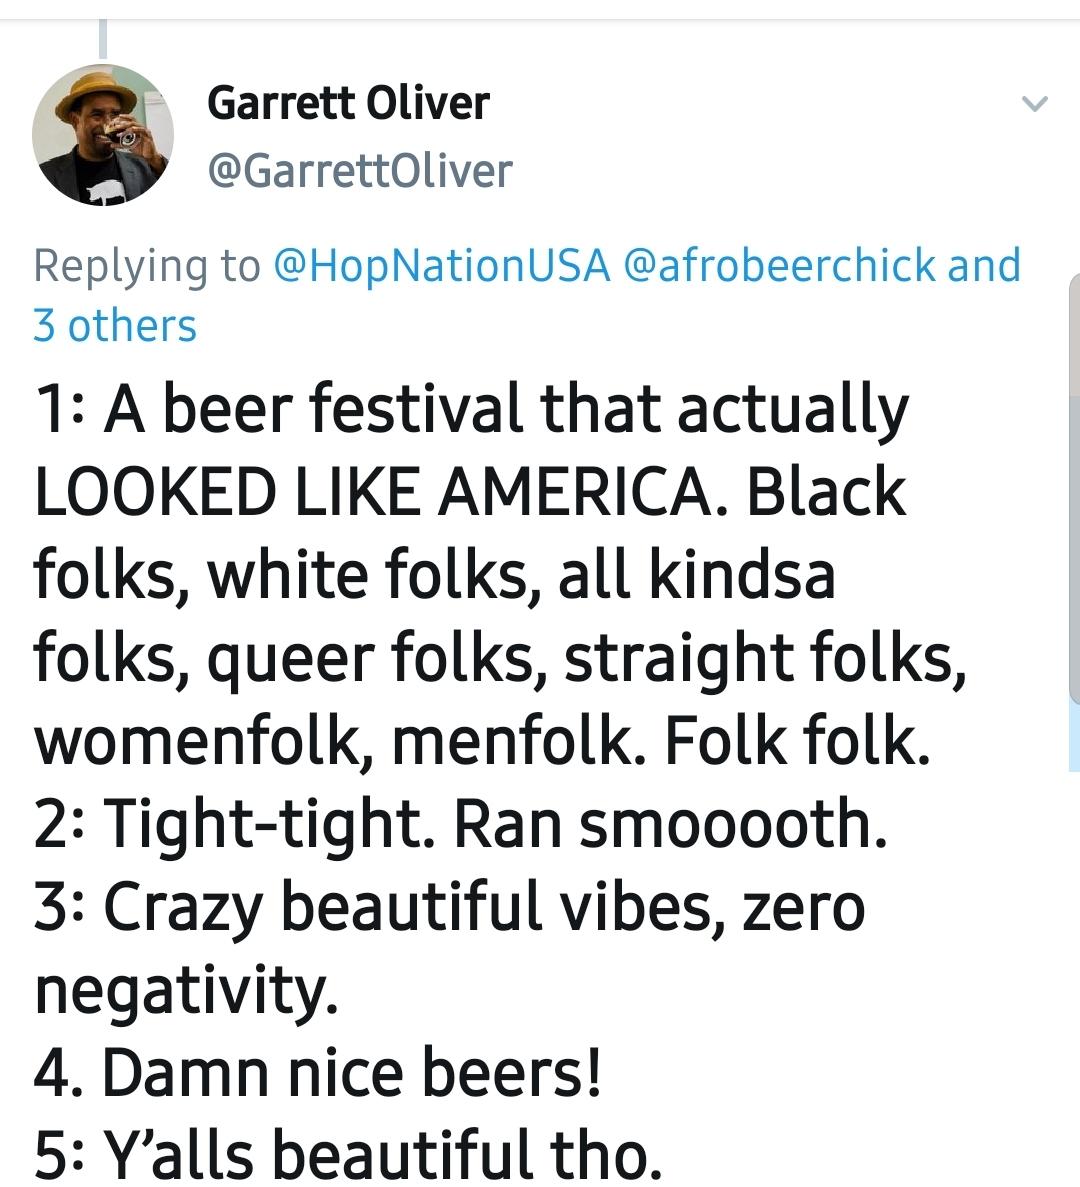 Garrett Oliver said it best… No other words needed